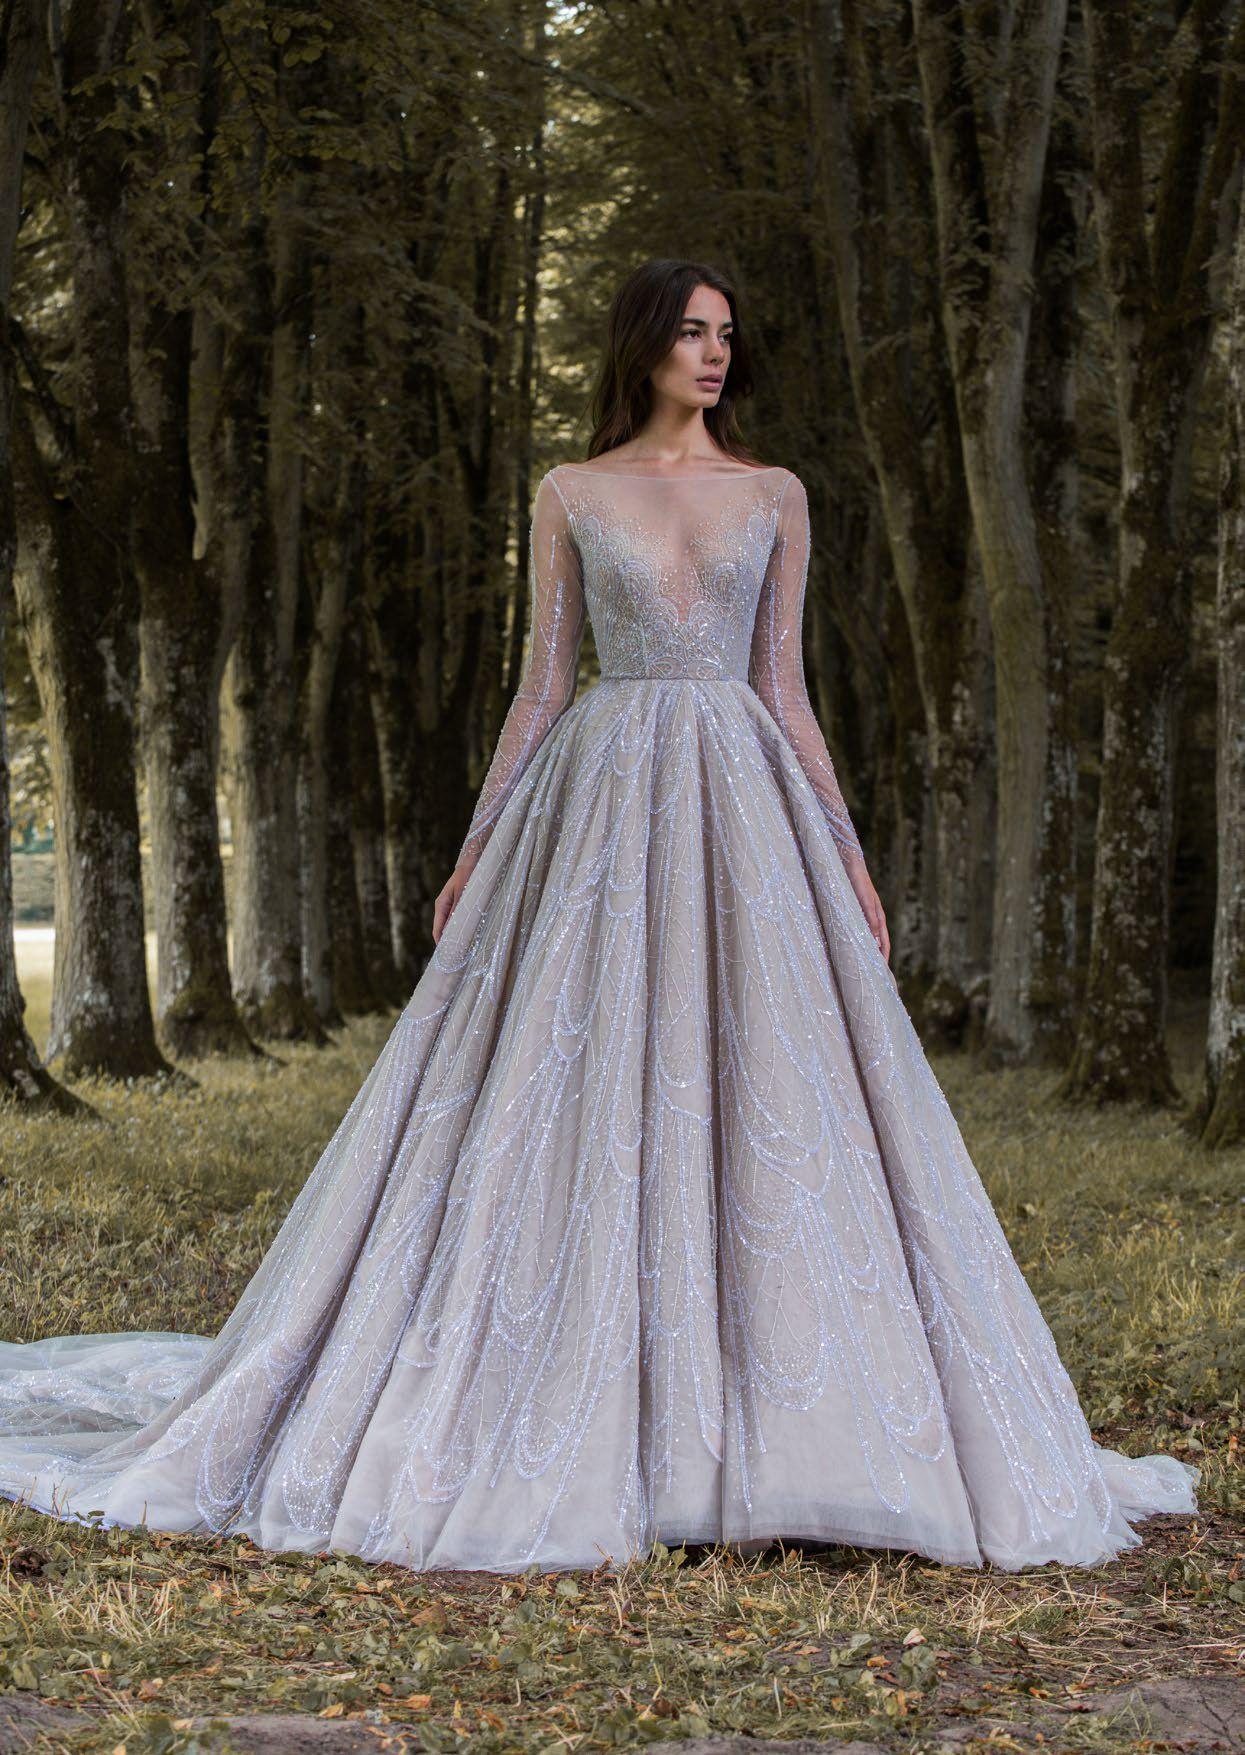 31+ Paolo sebastian wedding dresses price info